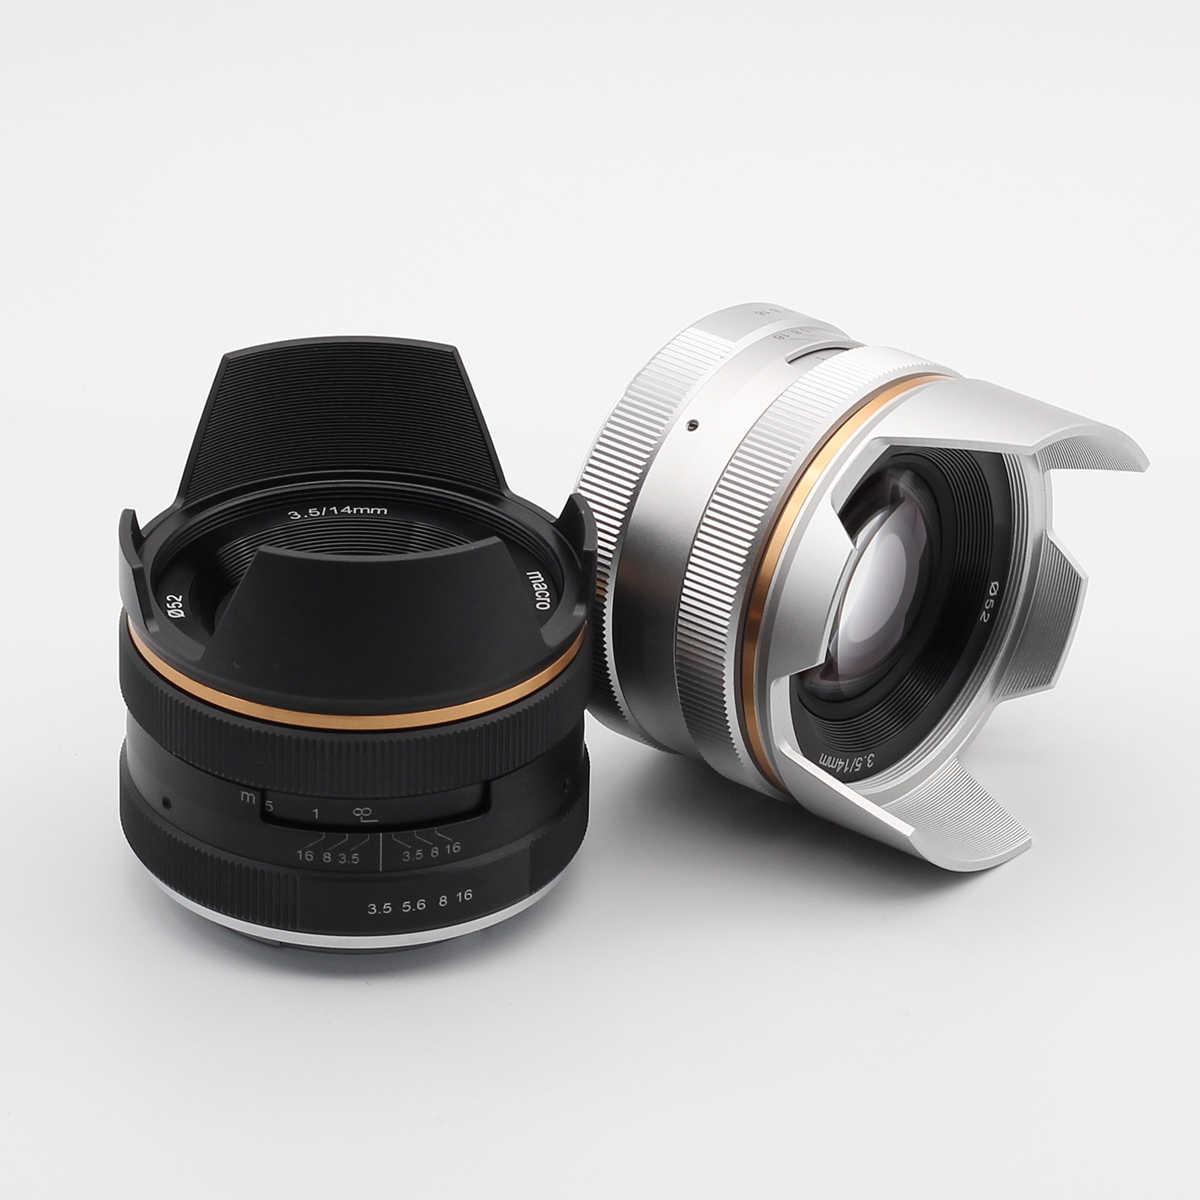 14 мм f/3,5 ручной объектив для sony E Mount NEX Canon EF-M EOS M Fujifilm FX X Olympus Pansonic M43 MFT Micro4/3 14 мм F3.5